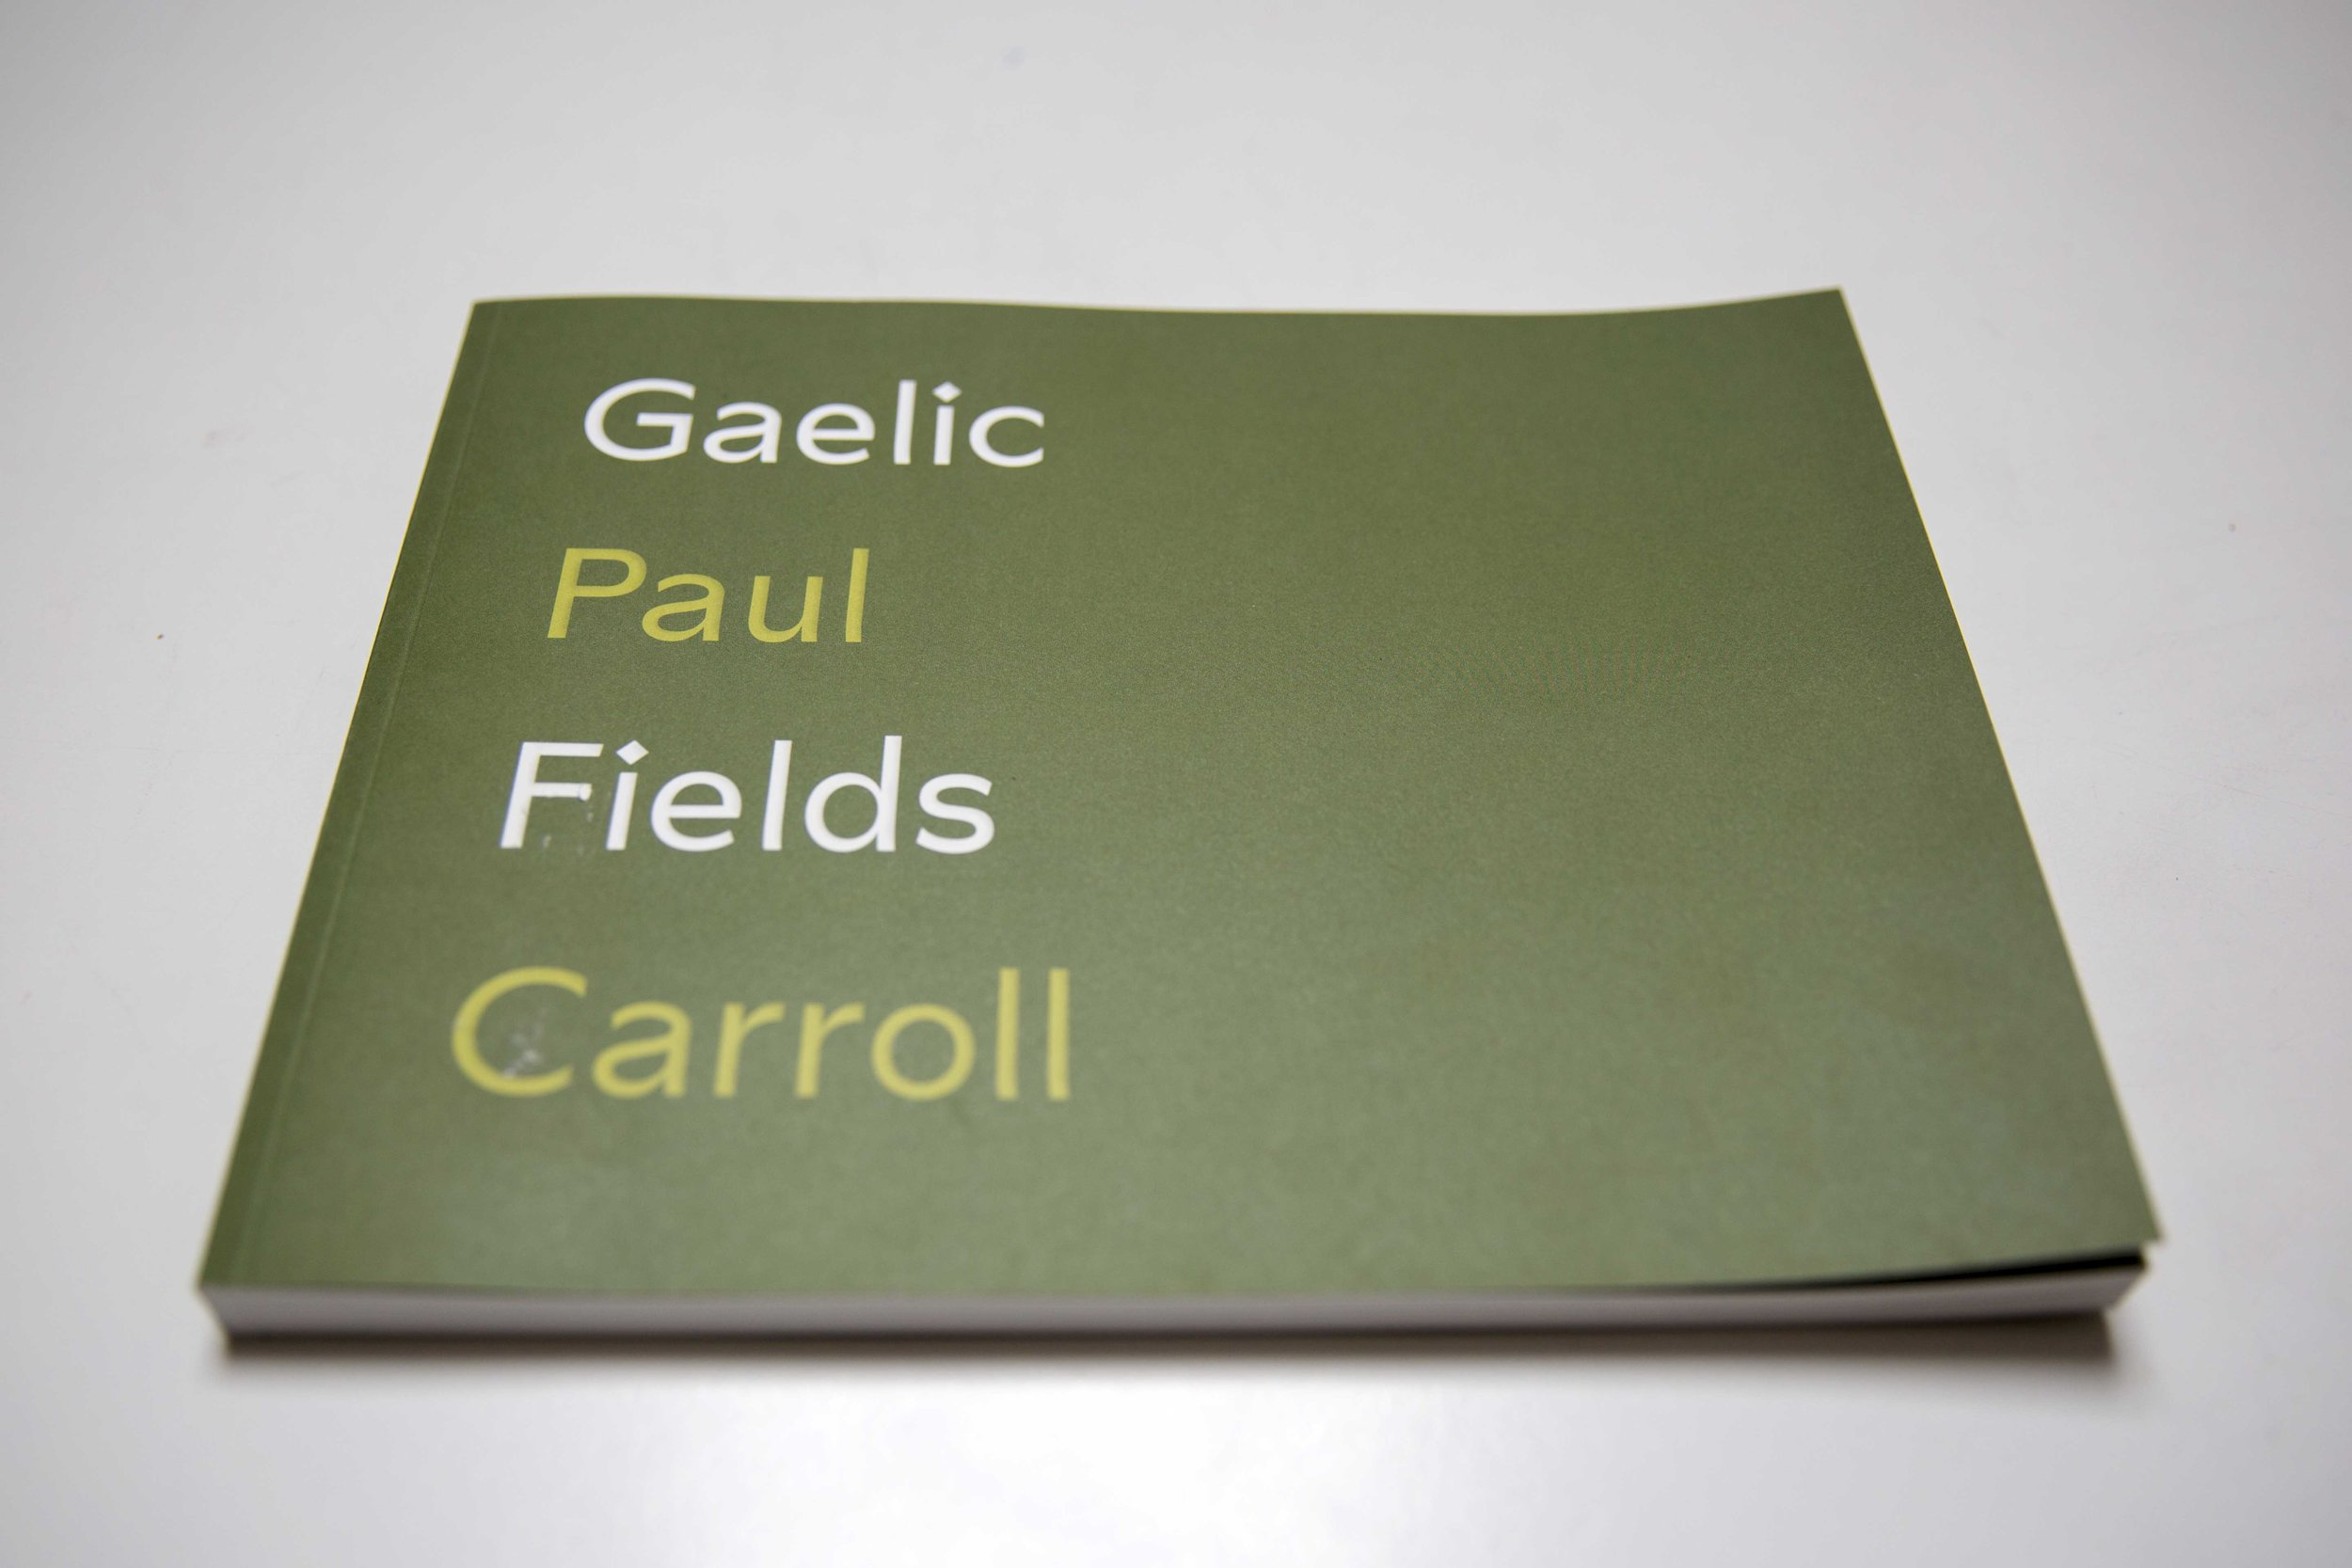 gaelicfieldsIMG_03_08_2019_3280.jpg